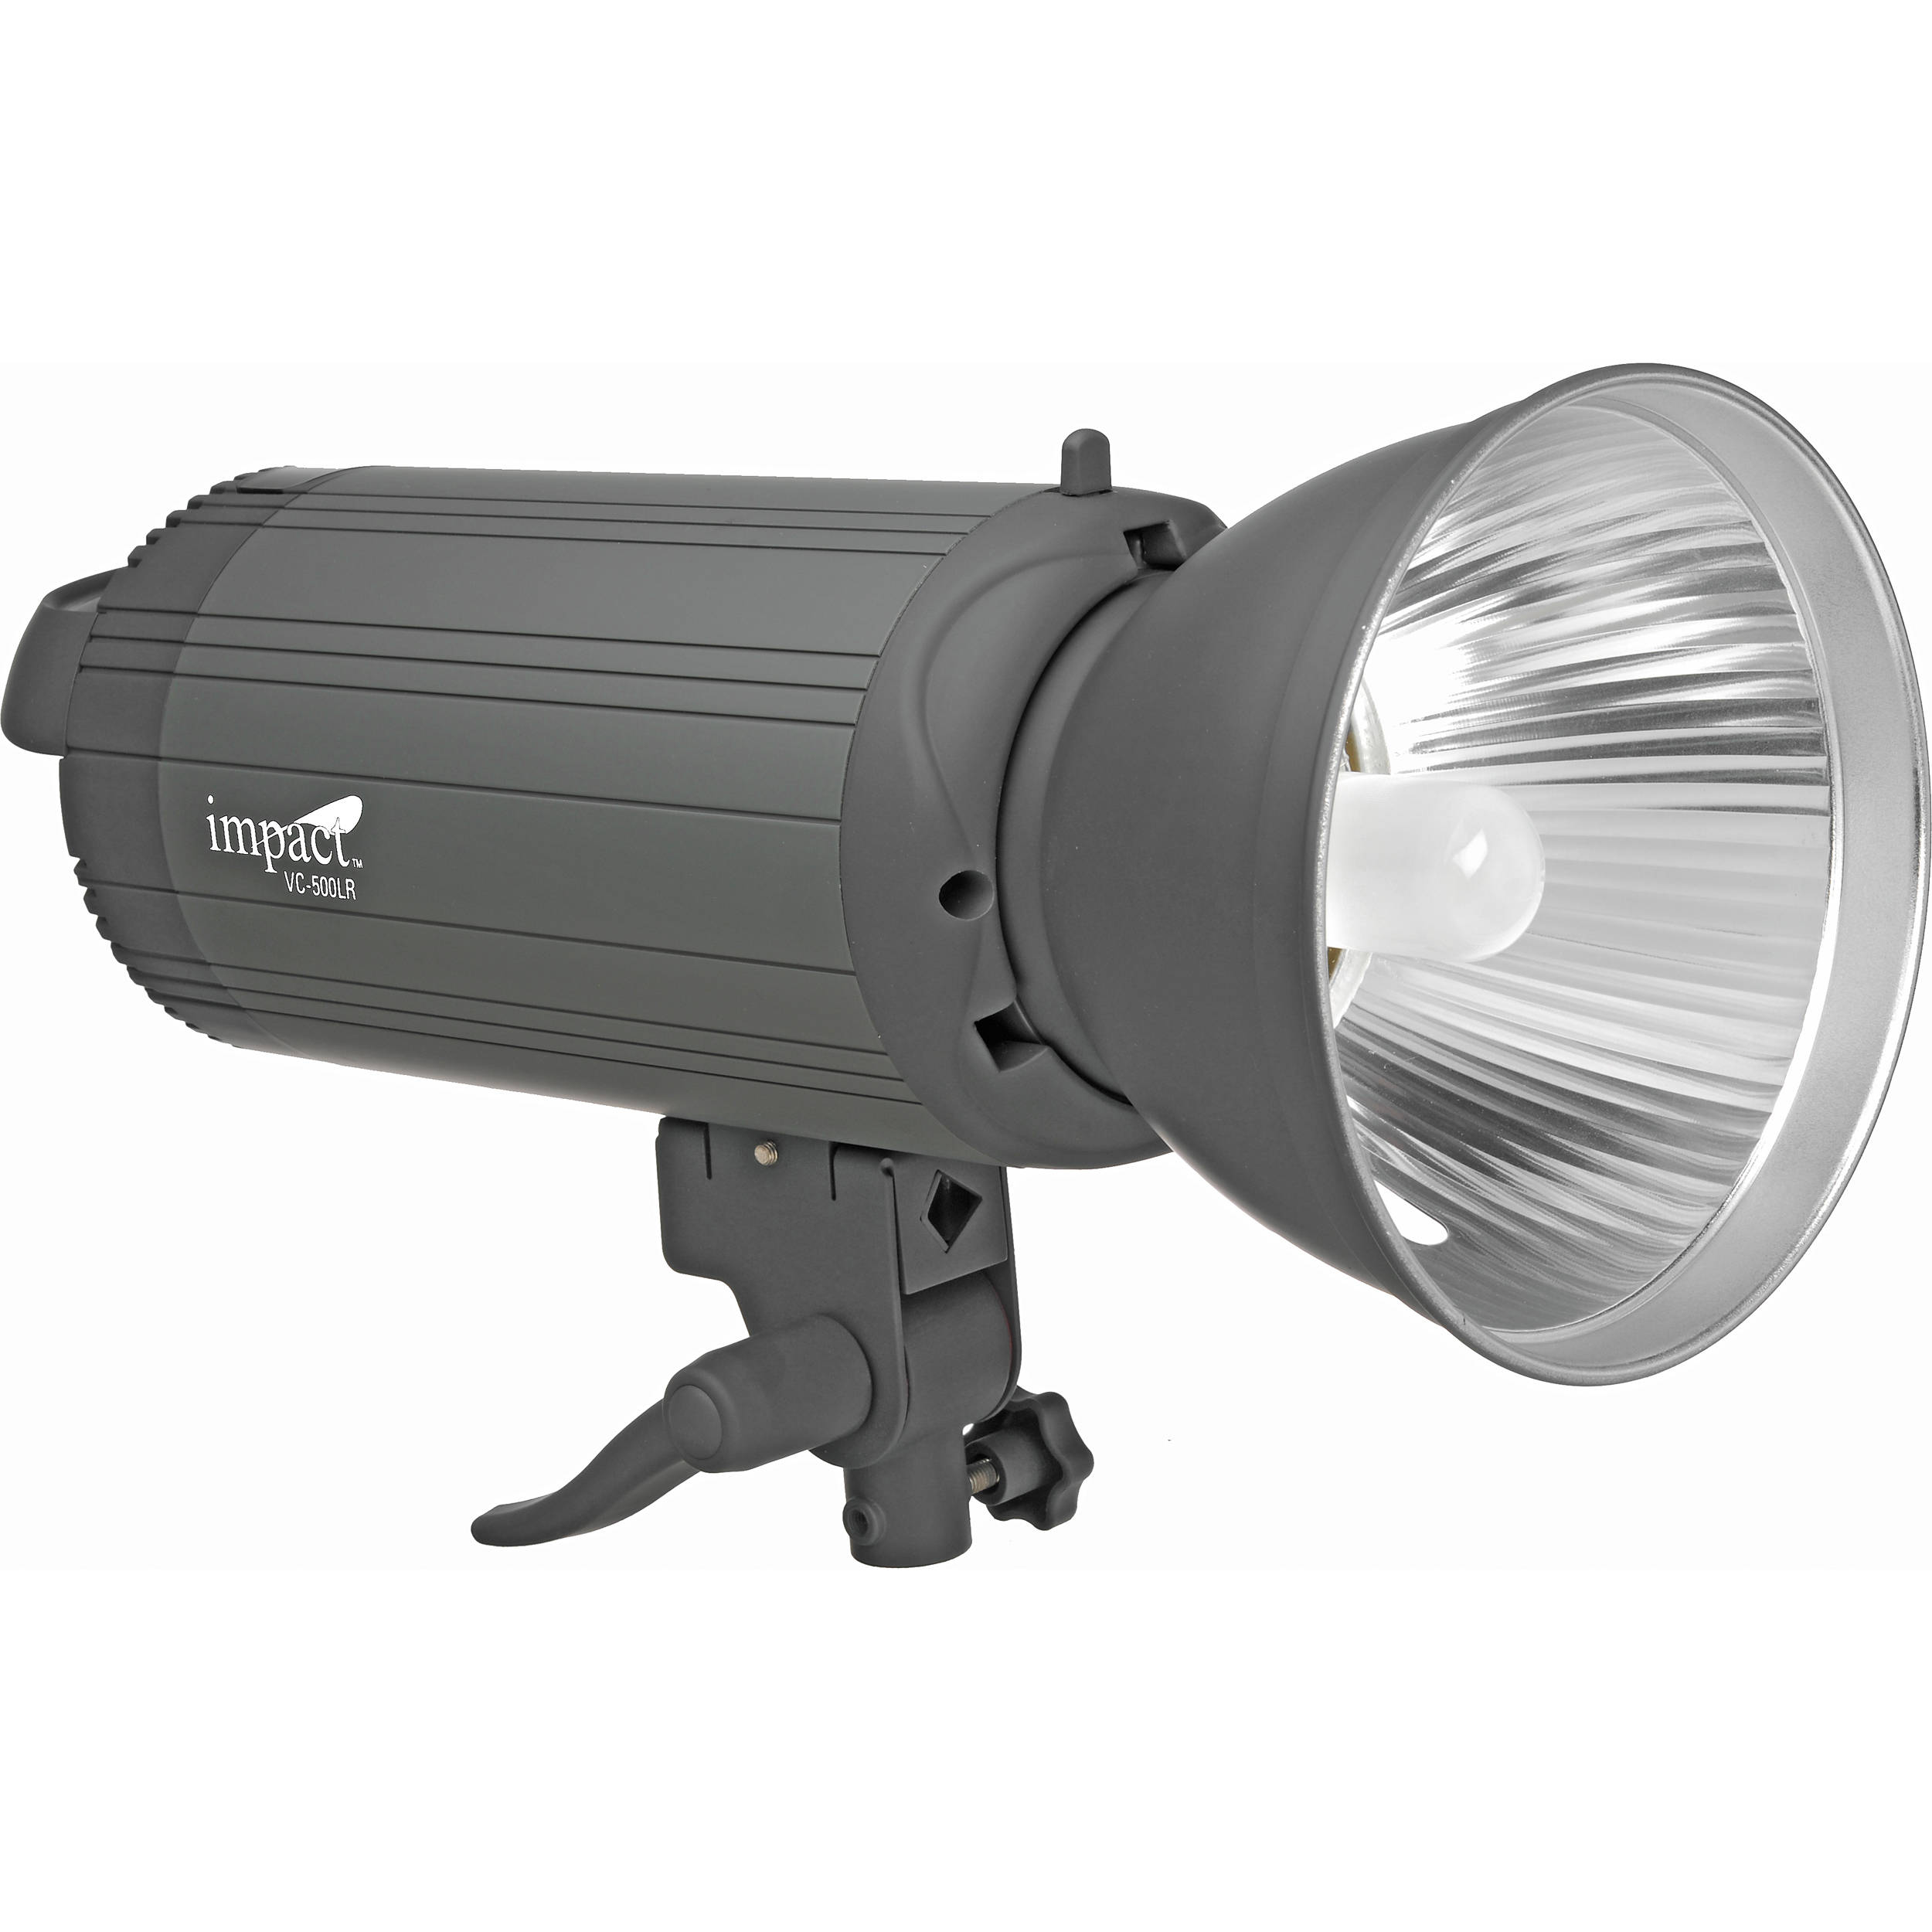 Impact VC 500LR Digital Monolight 120VAC